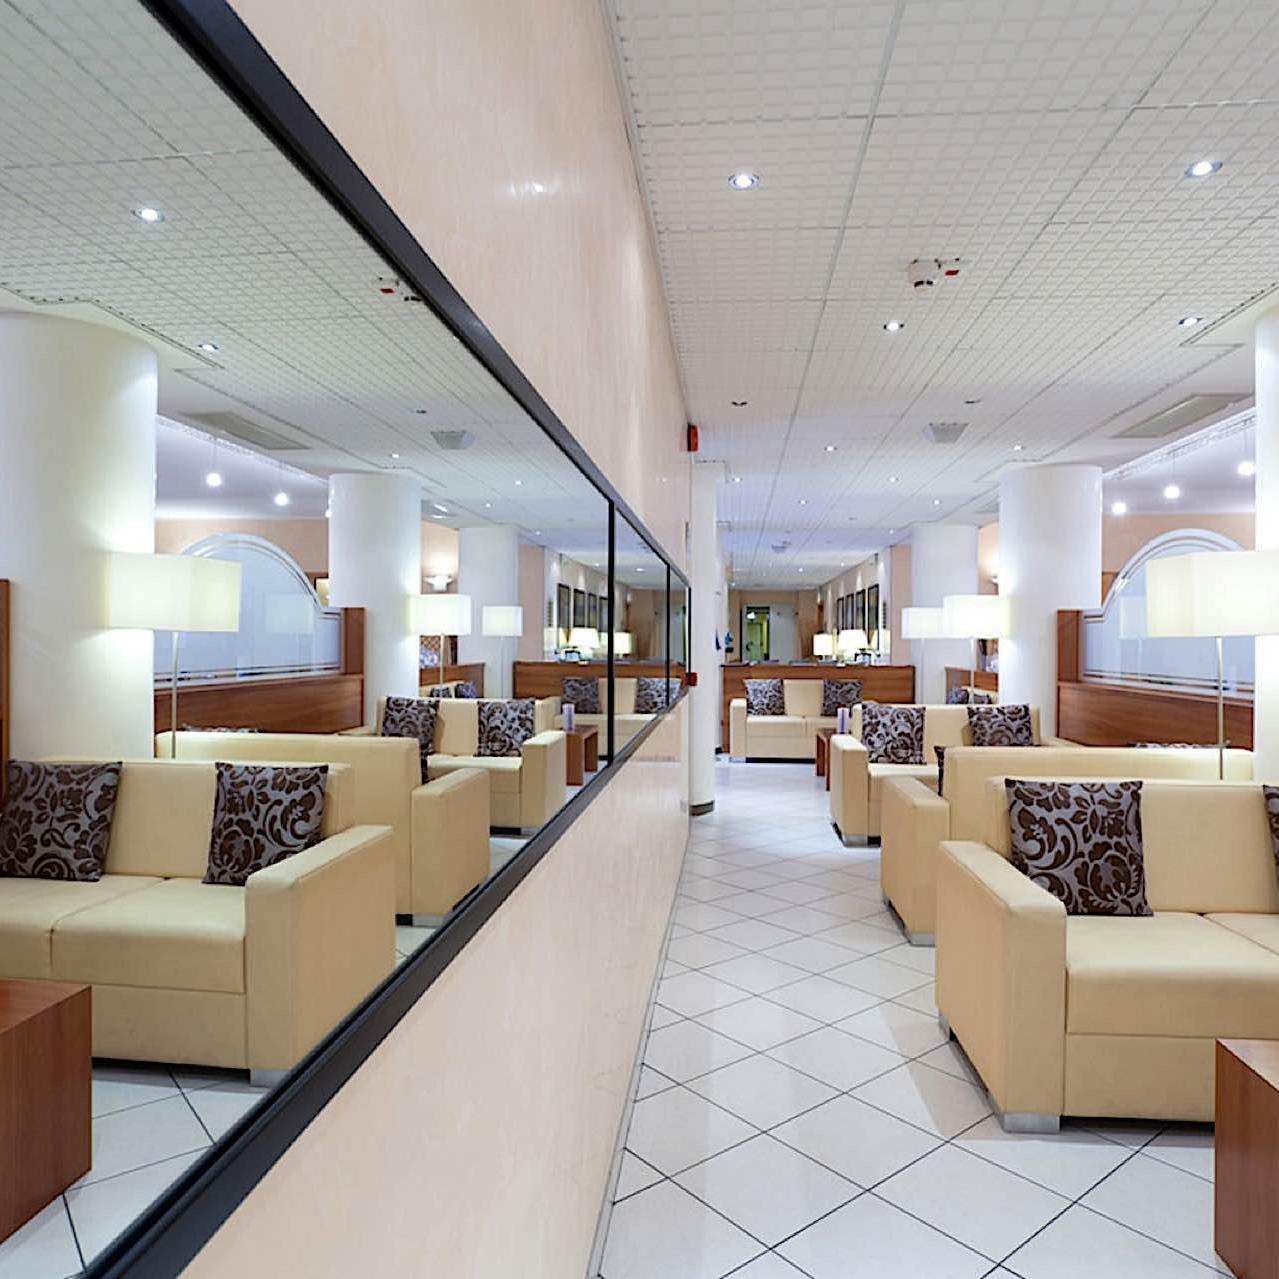 Hall | UNAWAY Hotel Occhiobello